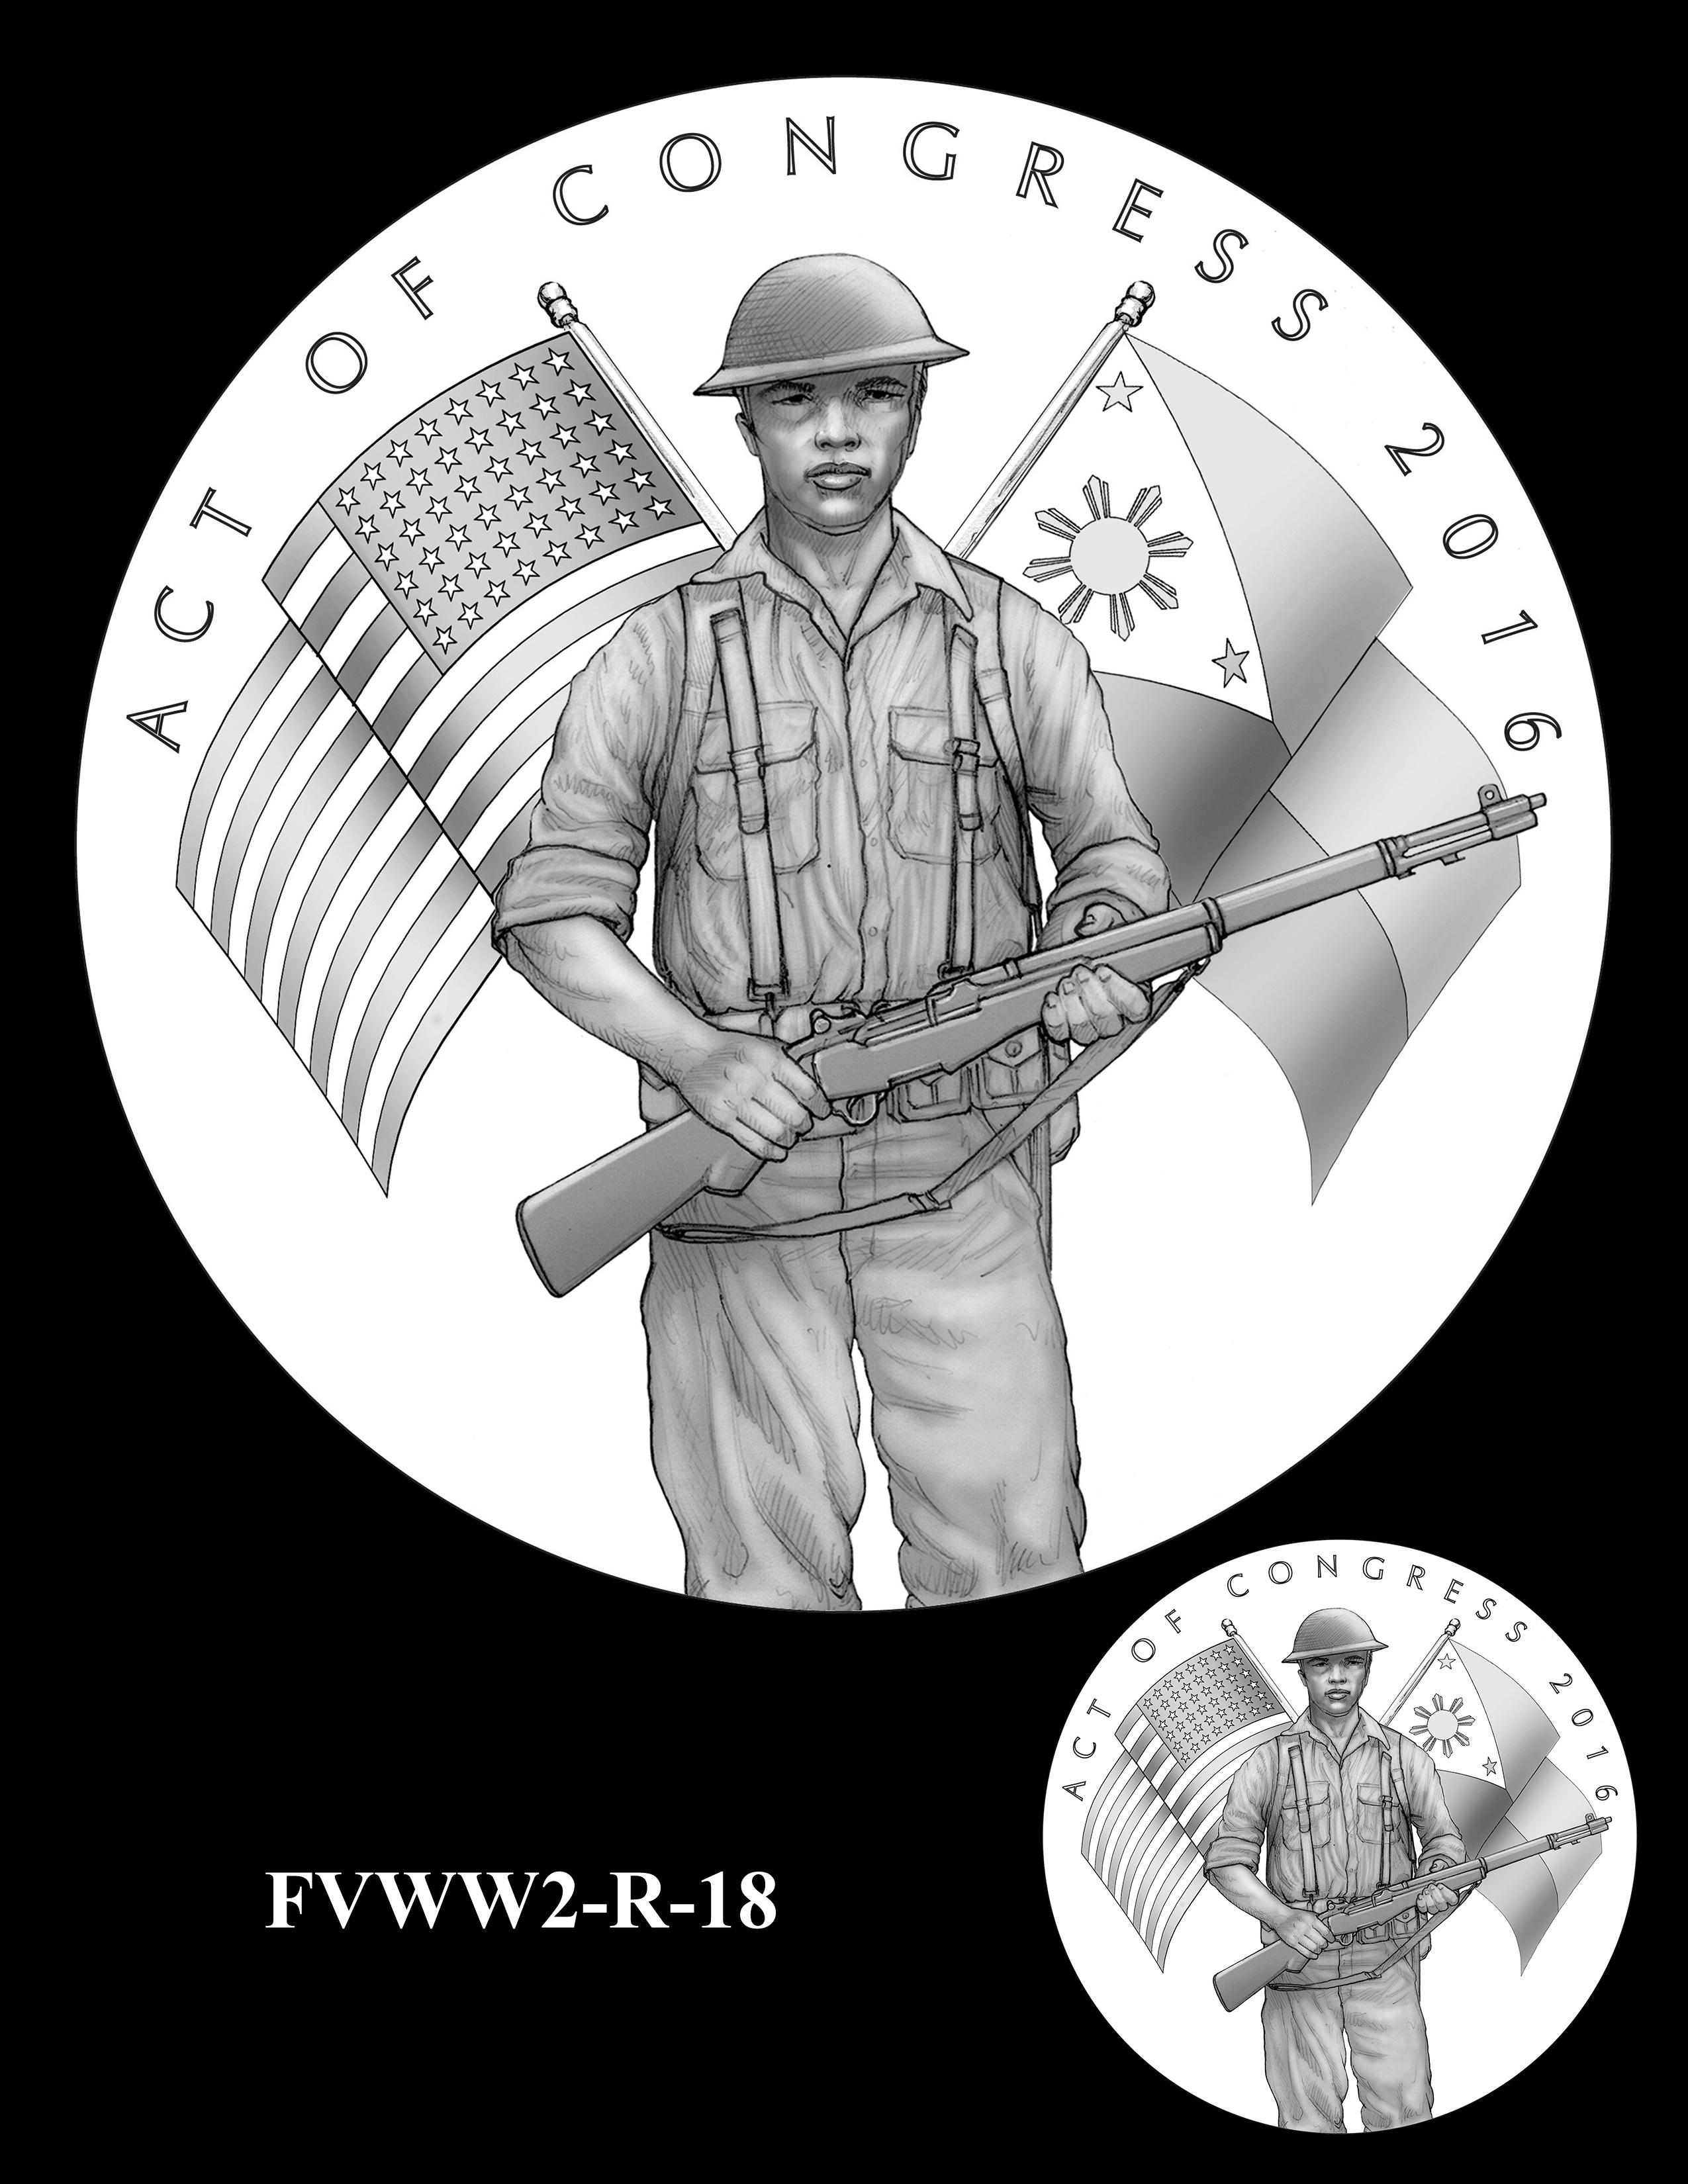 FVWW2-R-18 -- Filipino Veterans of World War II Congressional Gold Medal